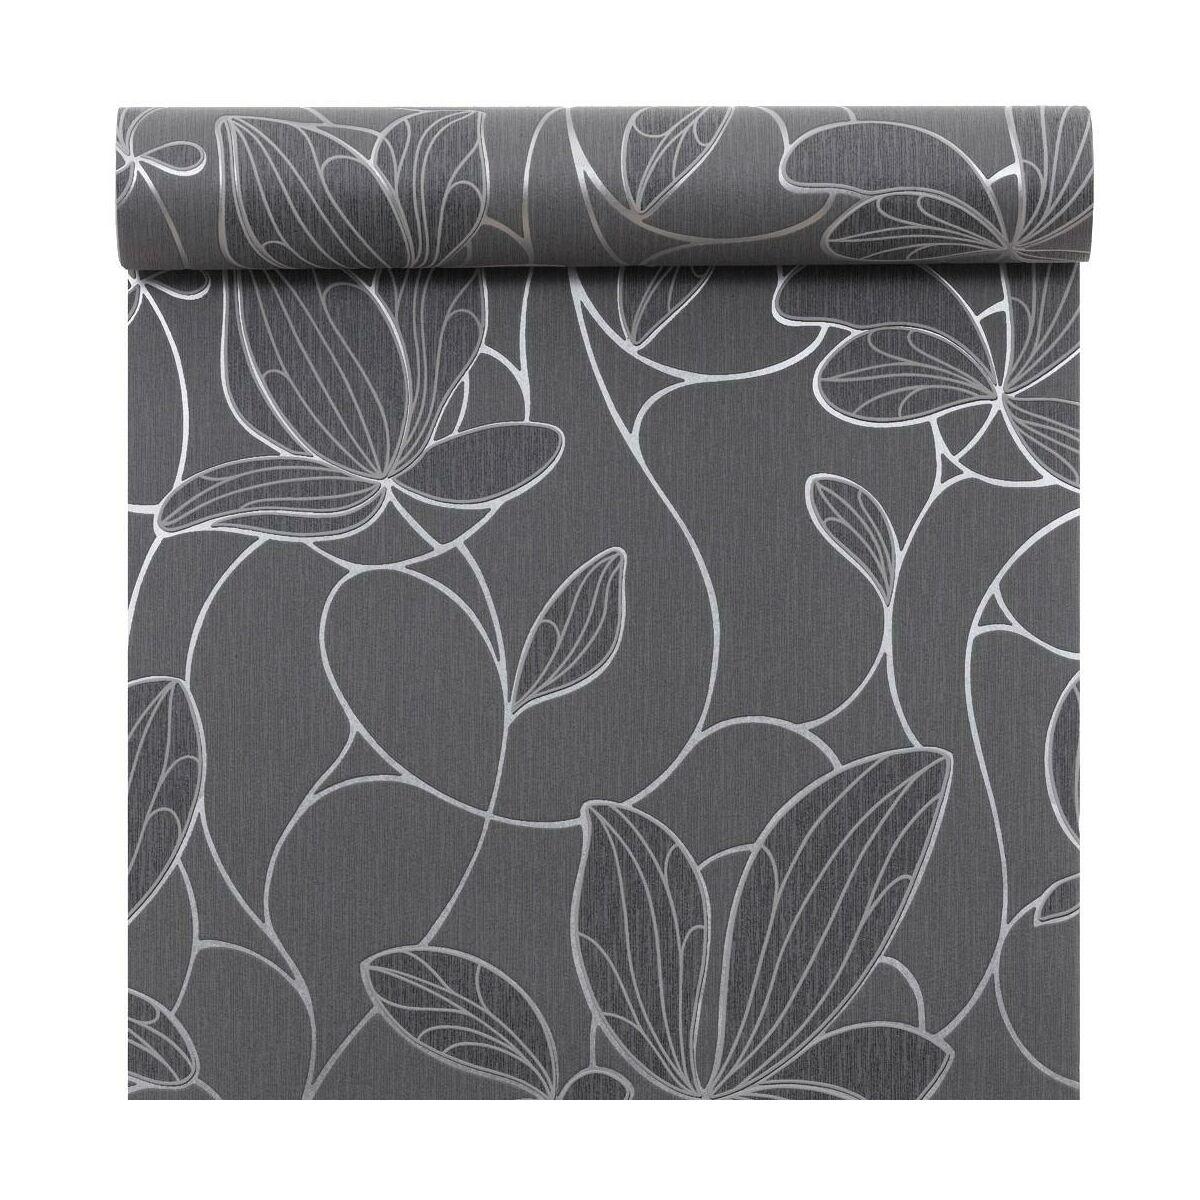 tapeta foret rasch sprawd opinie w leroy merlin. Black Bedroom Furniture Sets. Home Design Ideas